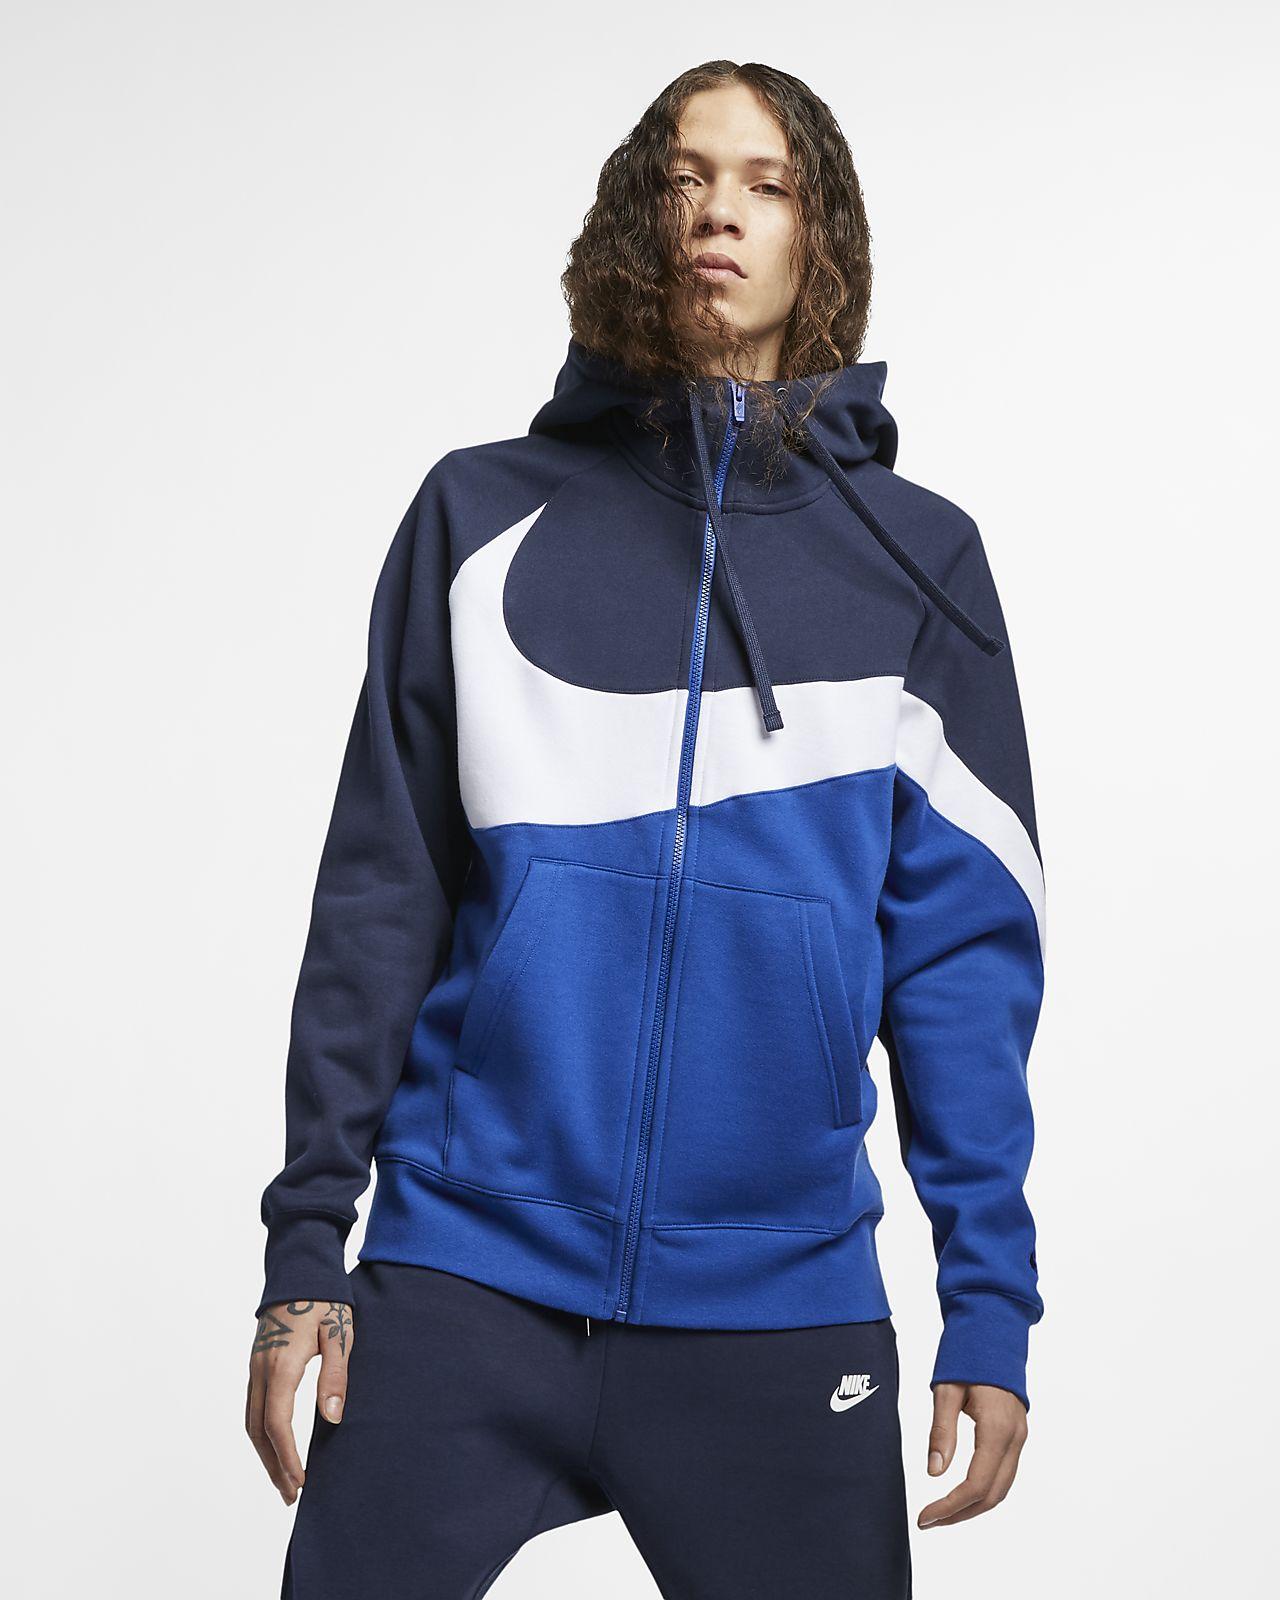 ca5d3d0f Nike Sportswear hettejakke med glidelås til herre. Nike.com NO